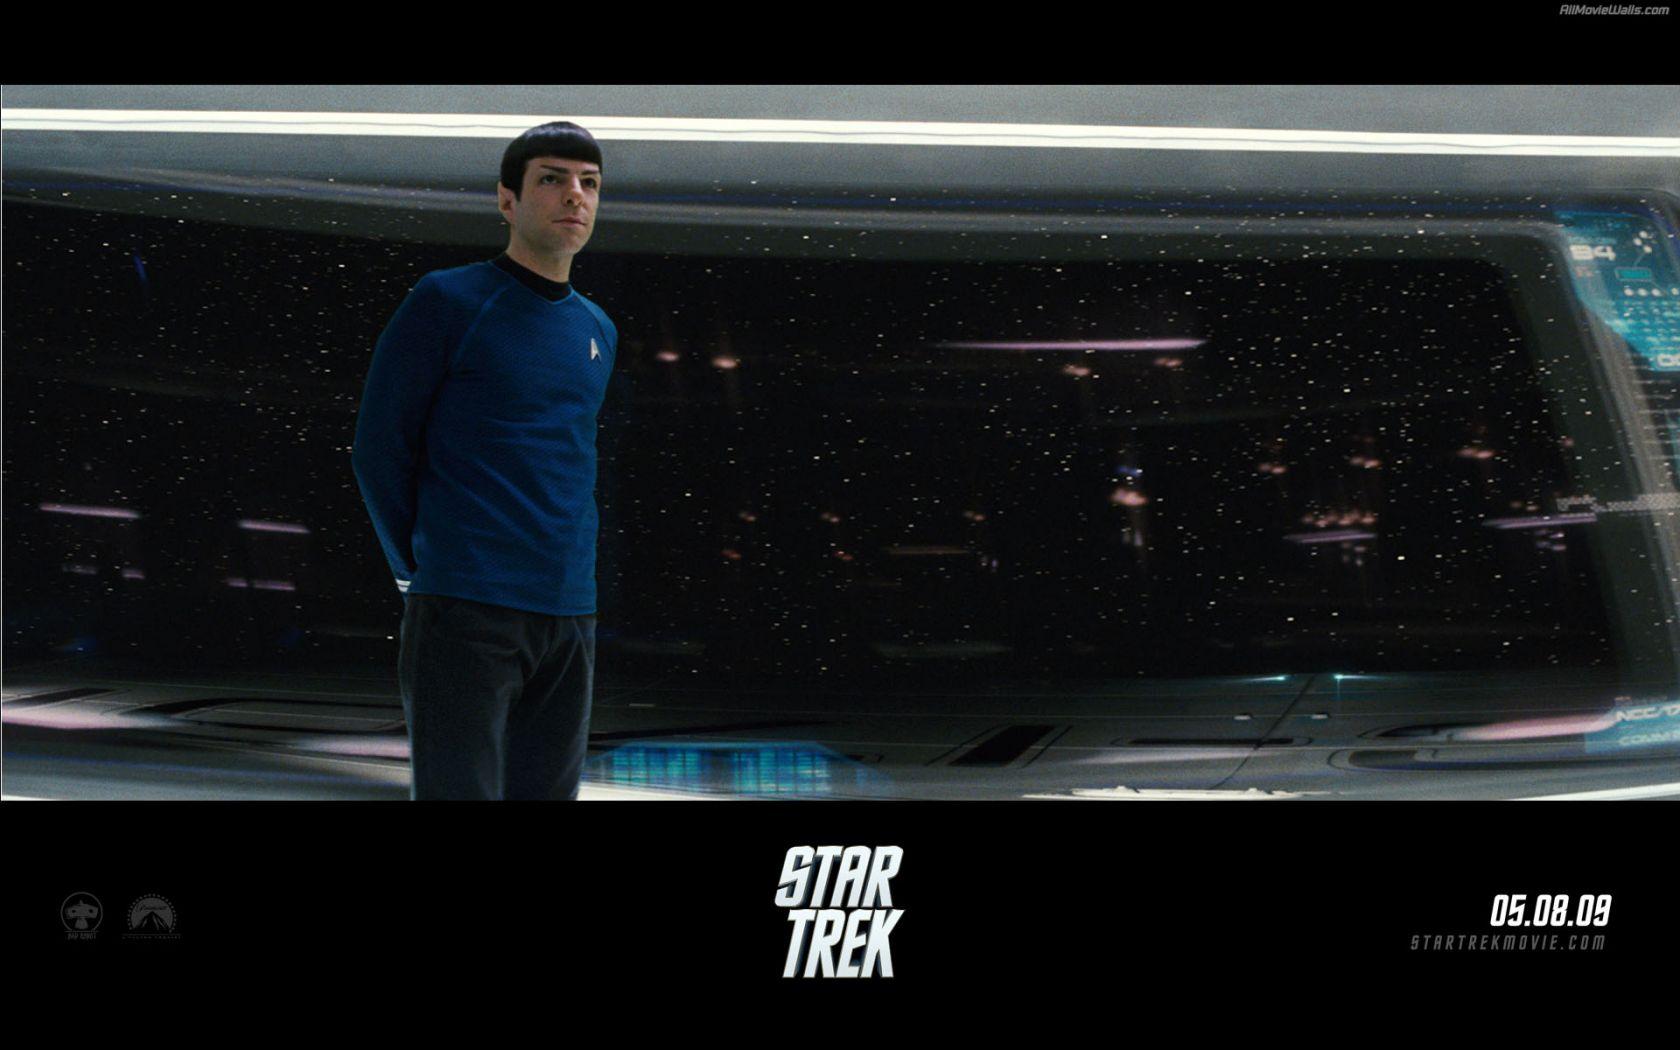 Spock Standing In Starship Bridge Poster Wallpaper 1680x1050